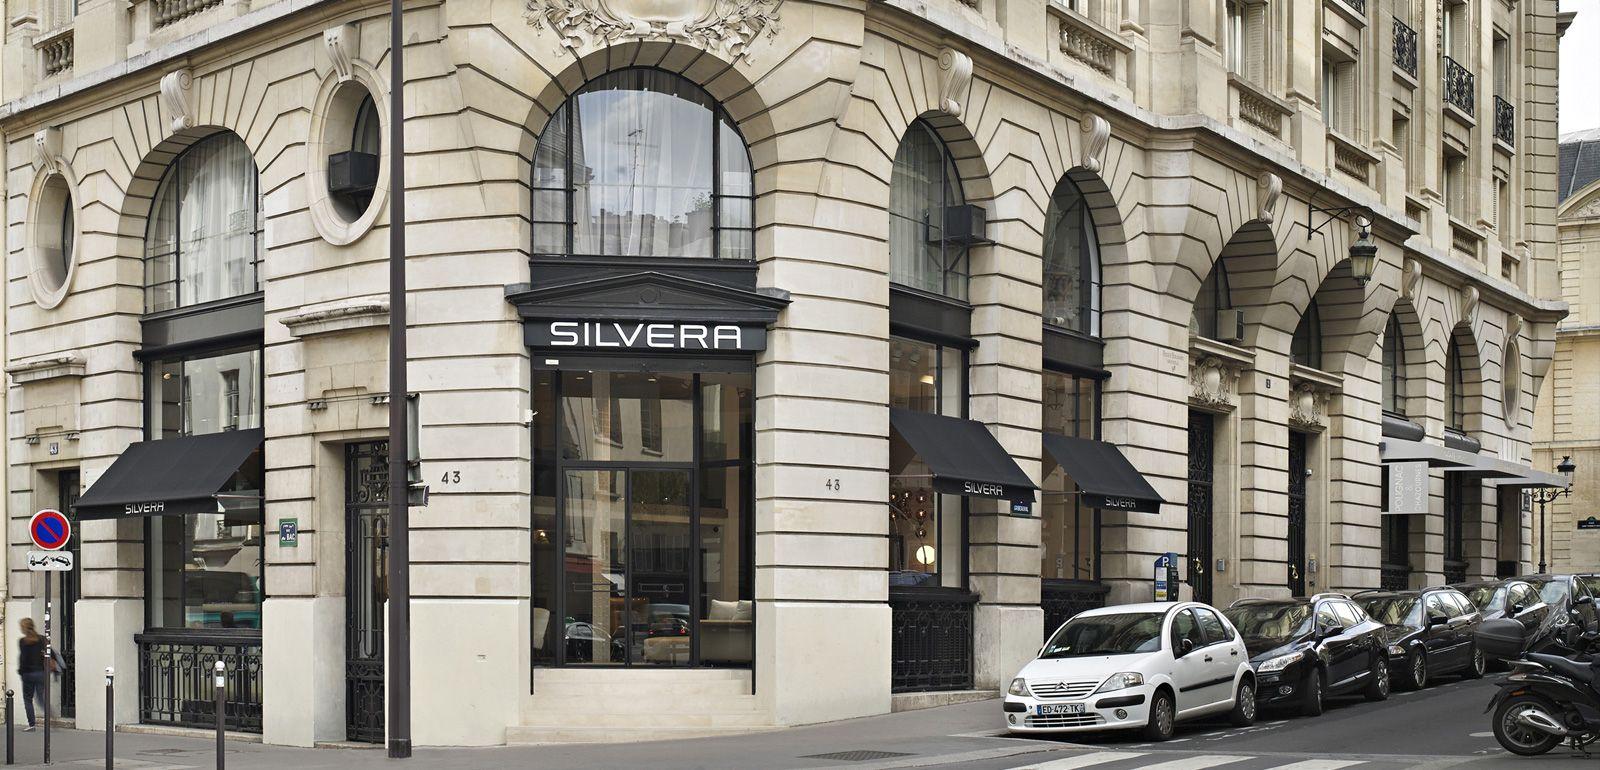 Silvera Bac Showroom